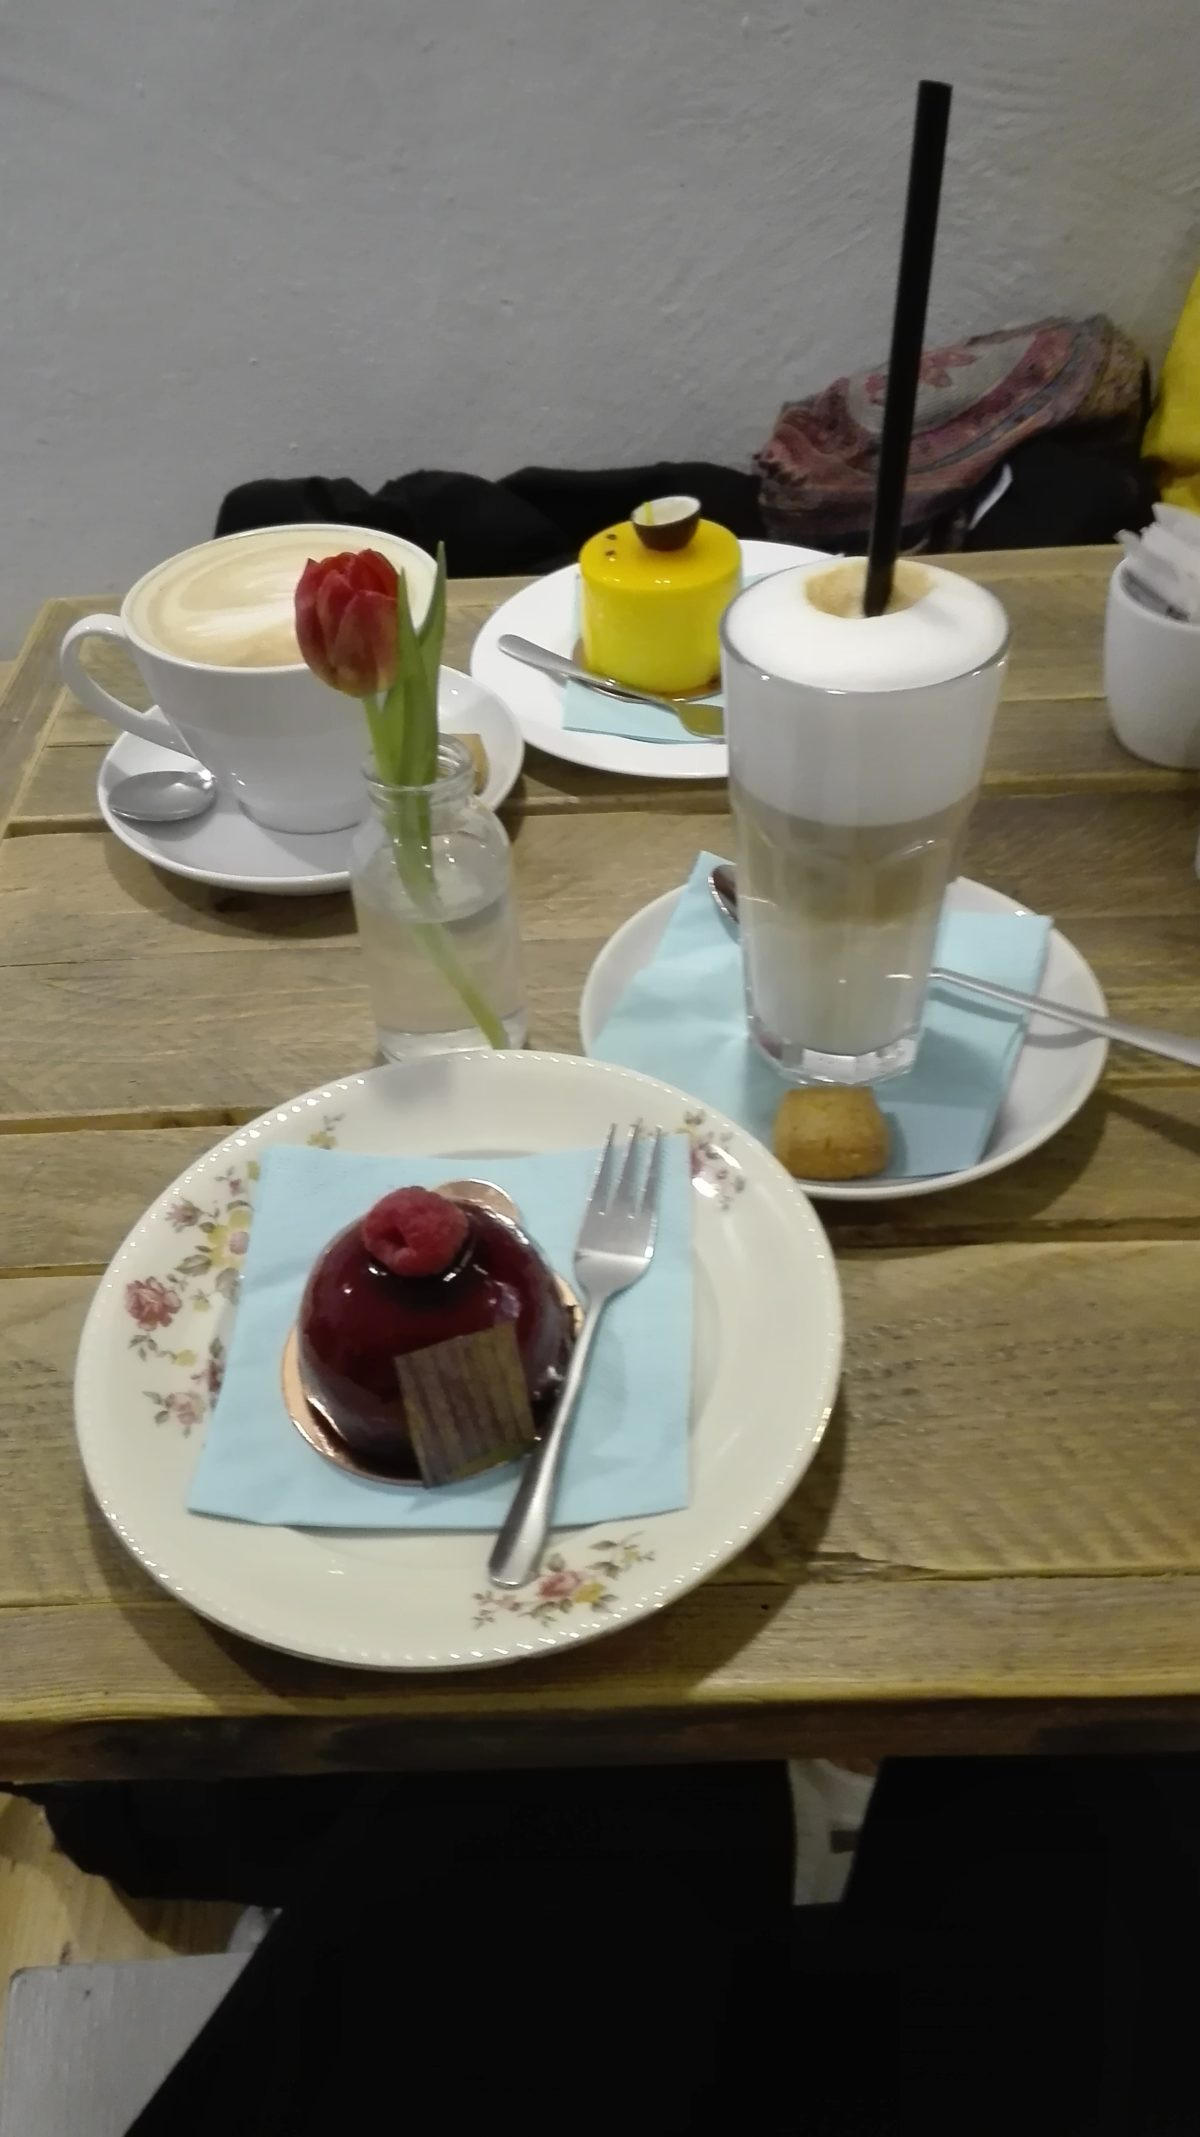 Törtchen der Patisserie Ludwig #Karlsruhe #Cafe  chilibluetendotcom